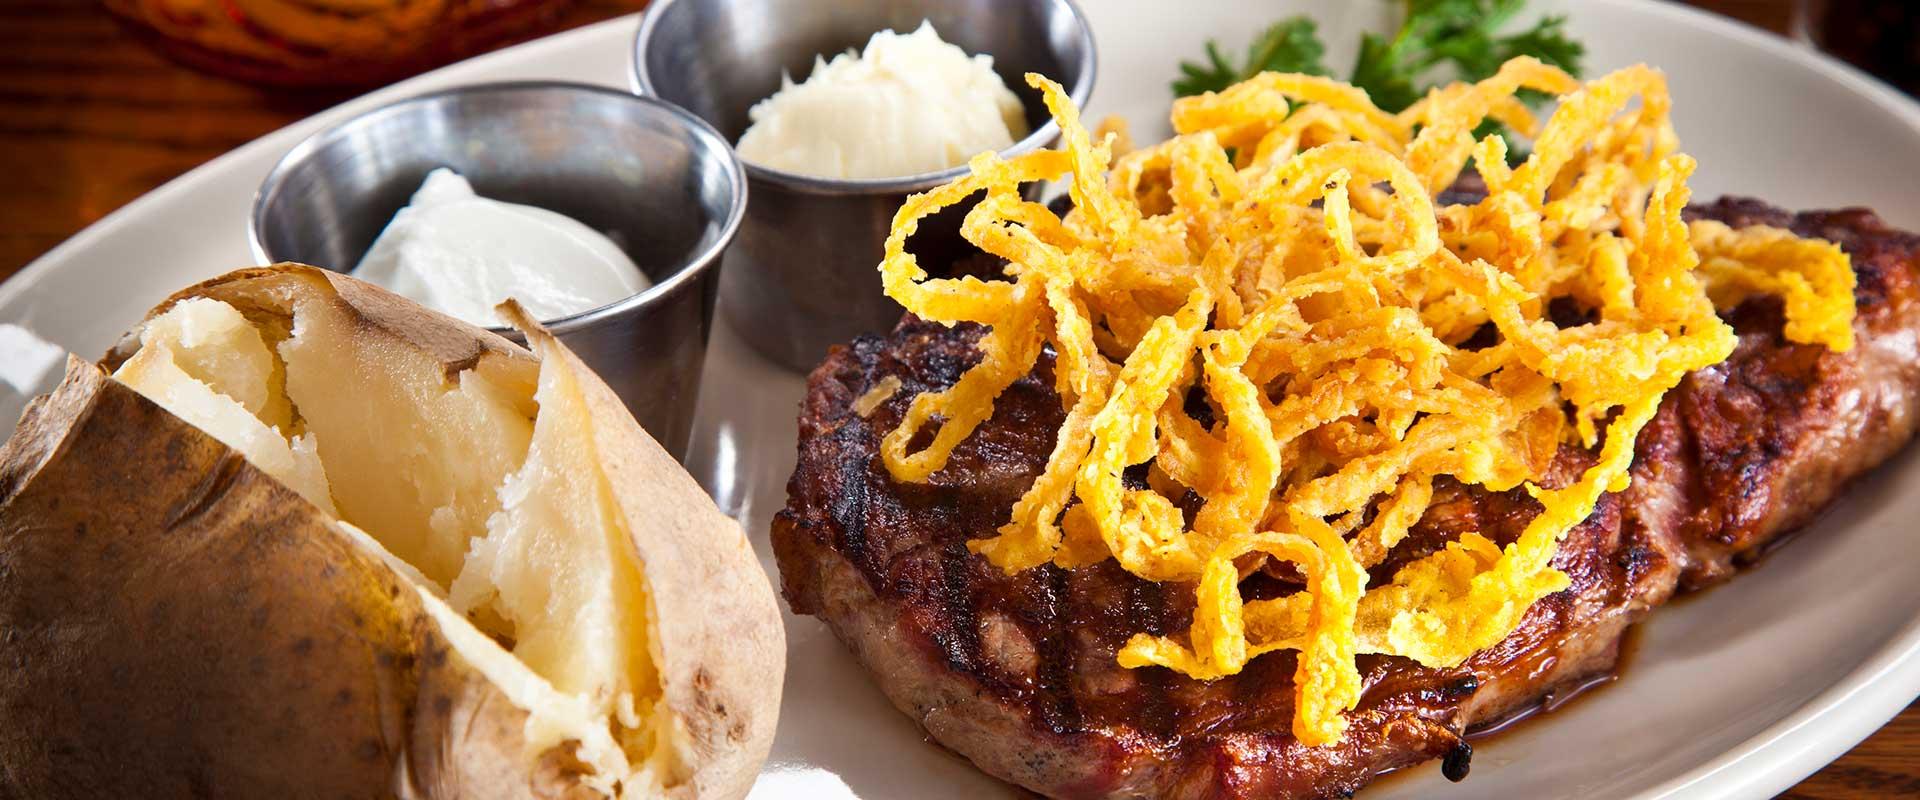 Burger And Steak Restaurants Near Me